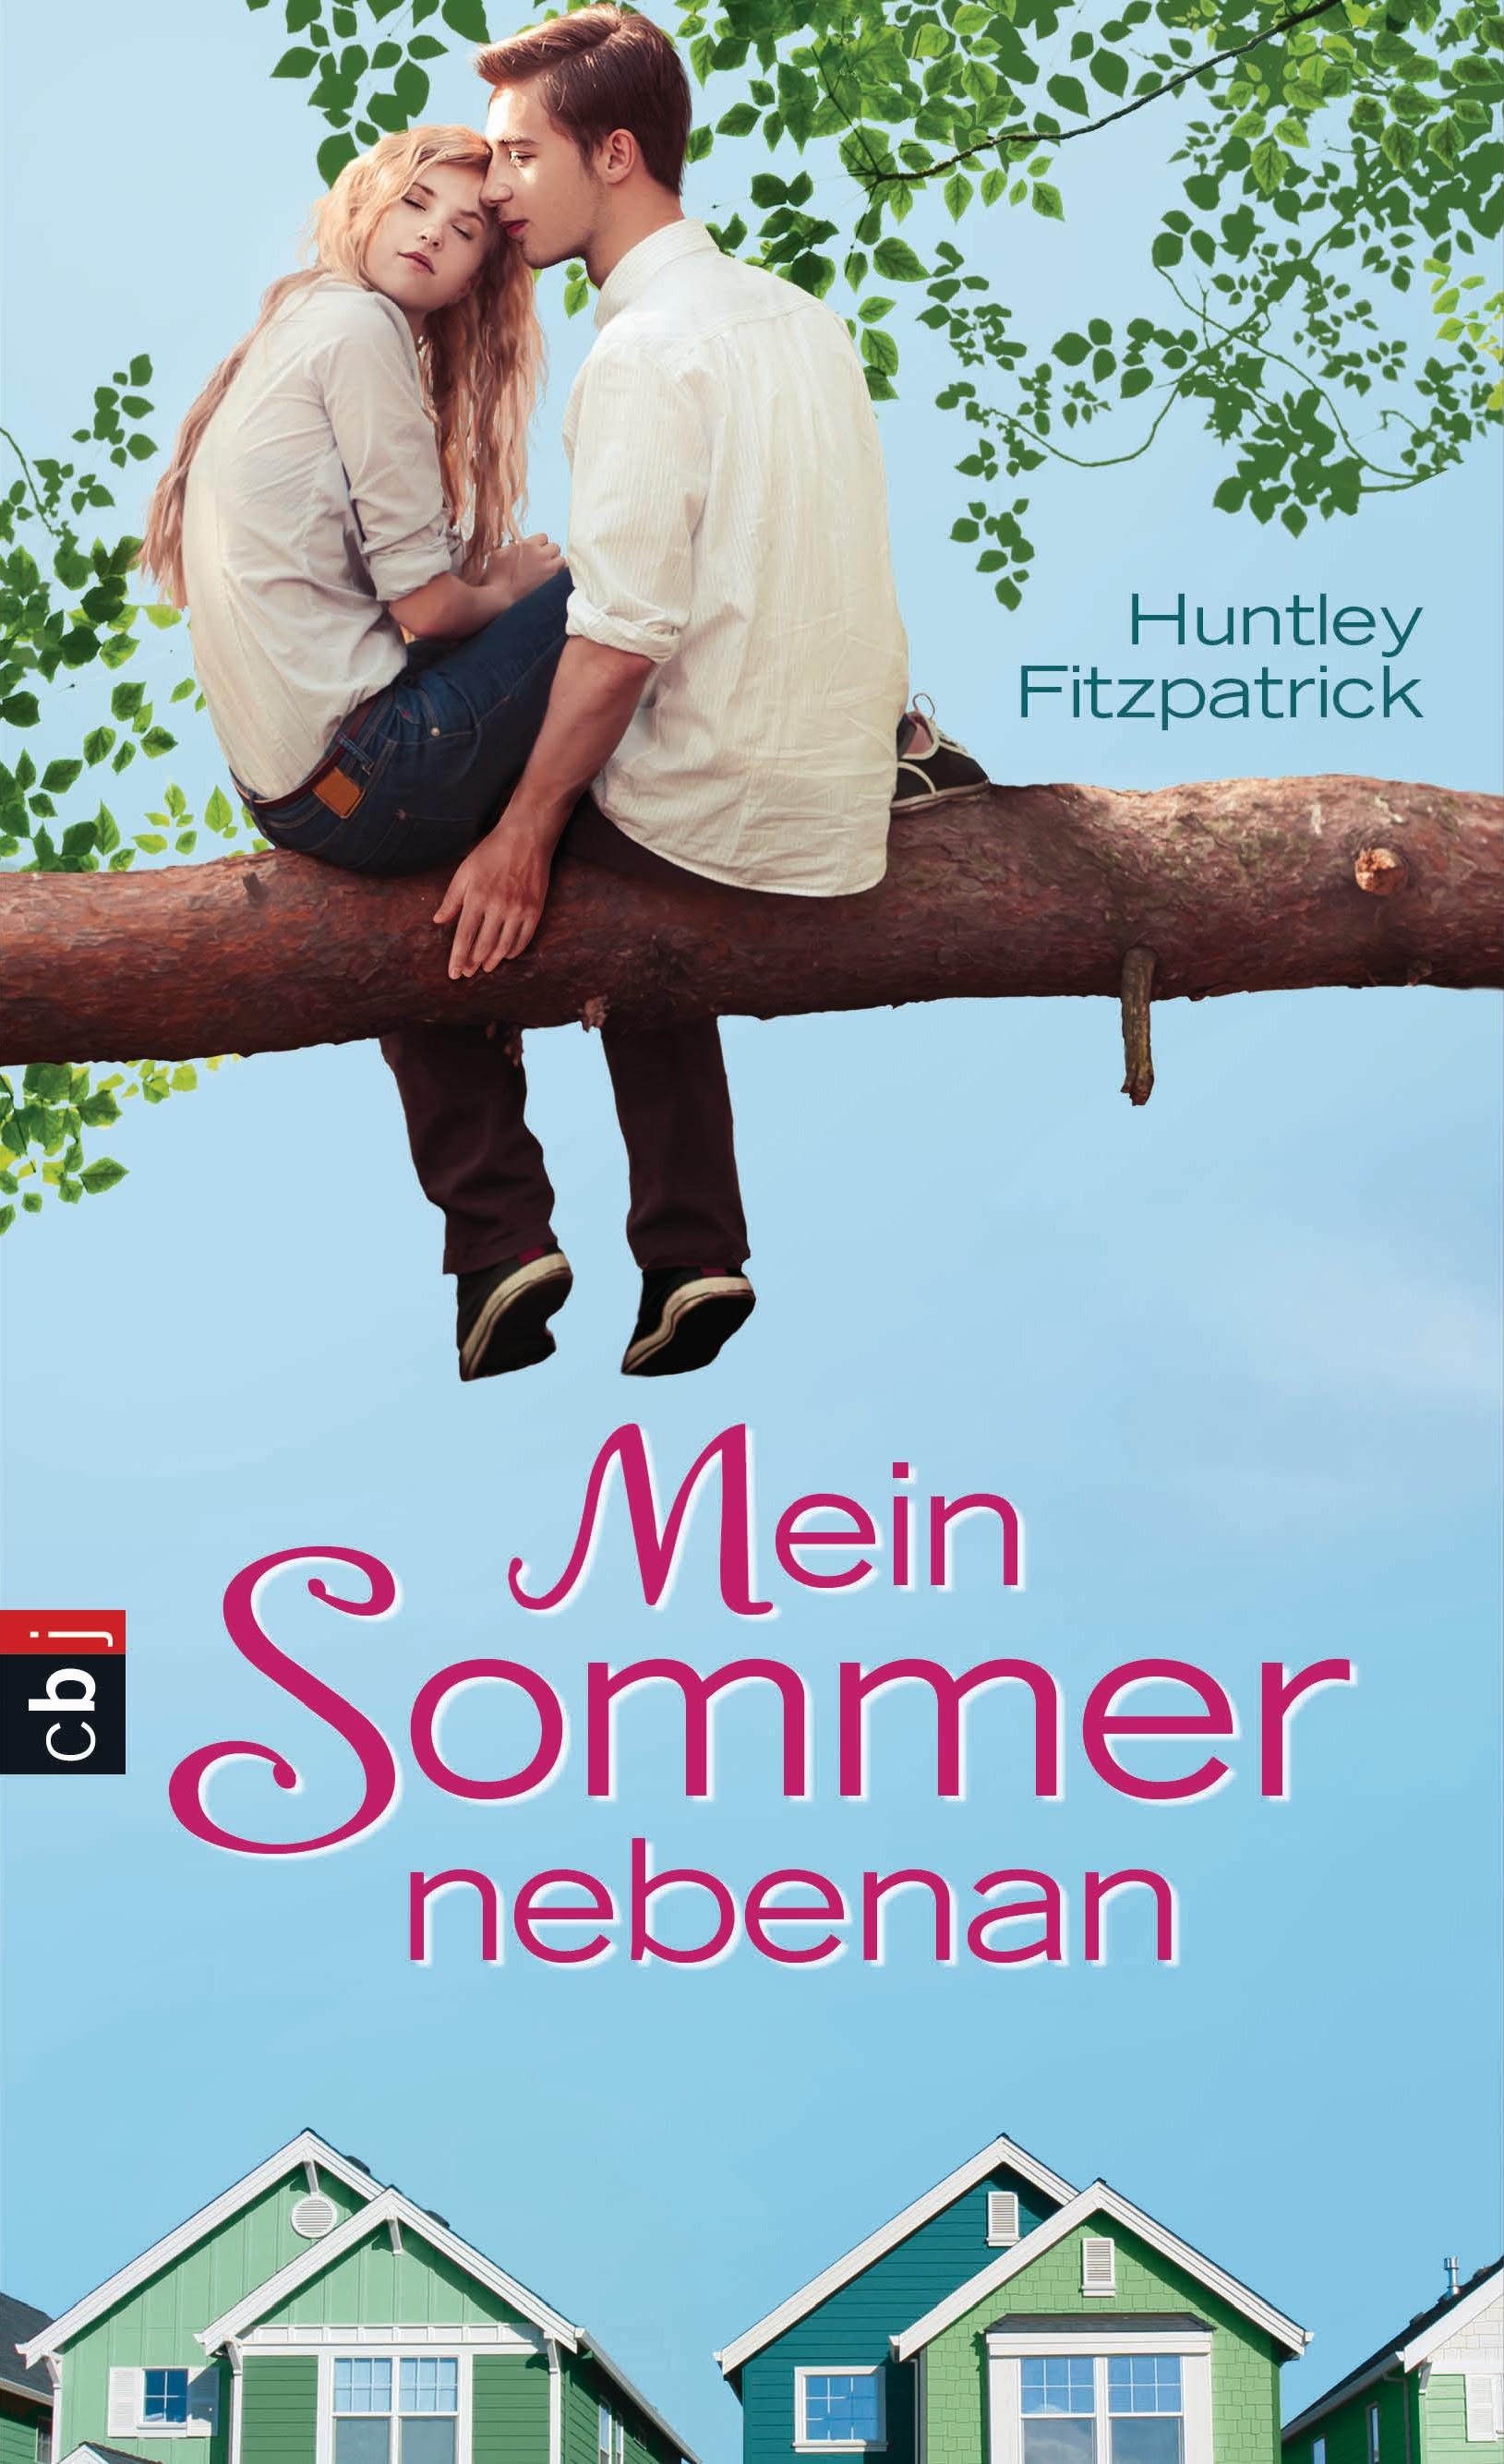 http://www.arvelle.de/product_info.php/info/p441930_buch-maengelexemplar-Mein-Sommer-nebenan-Huntley-Fitzpatrick.html